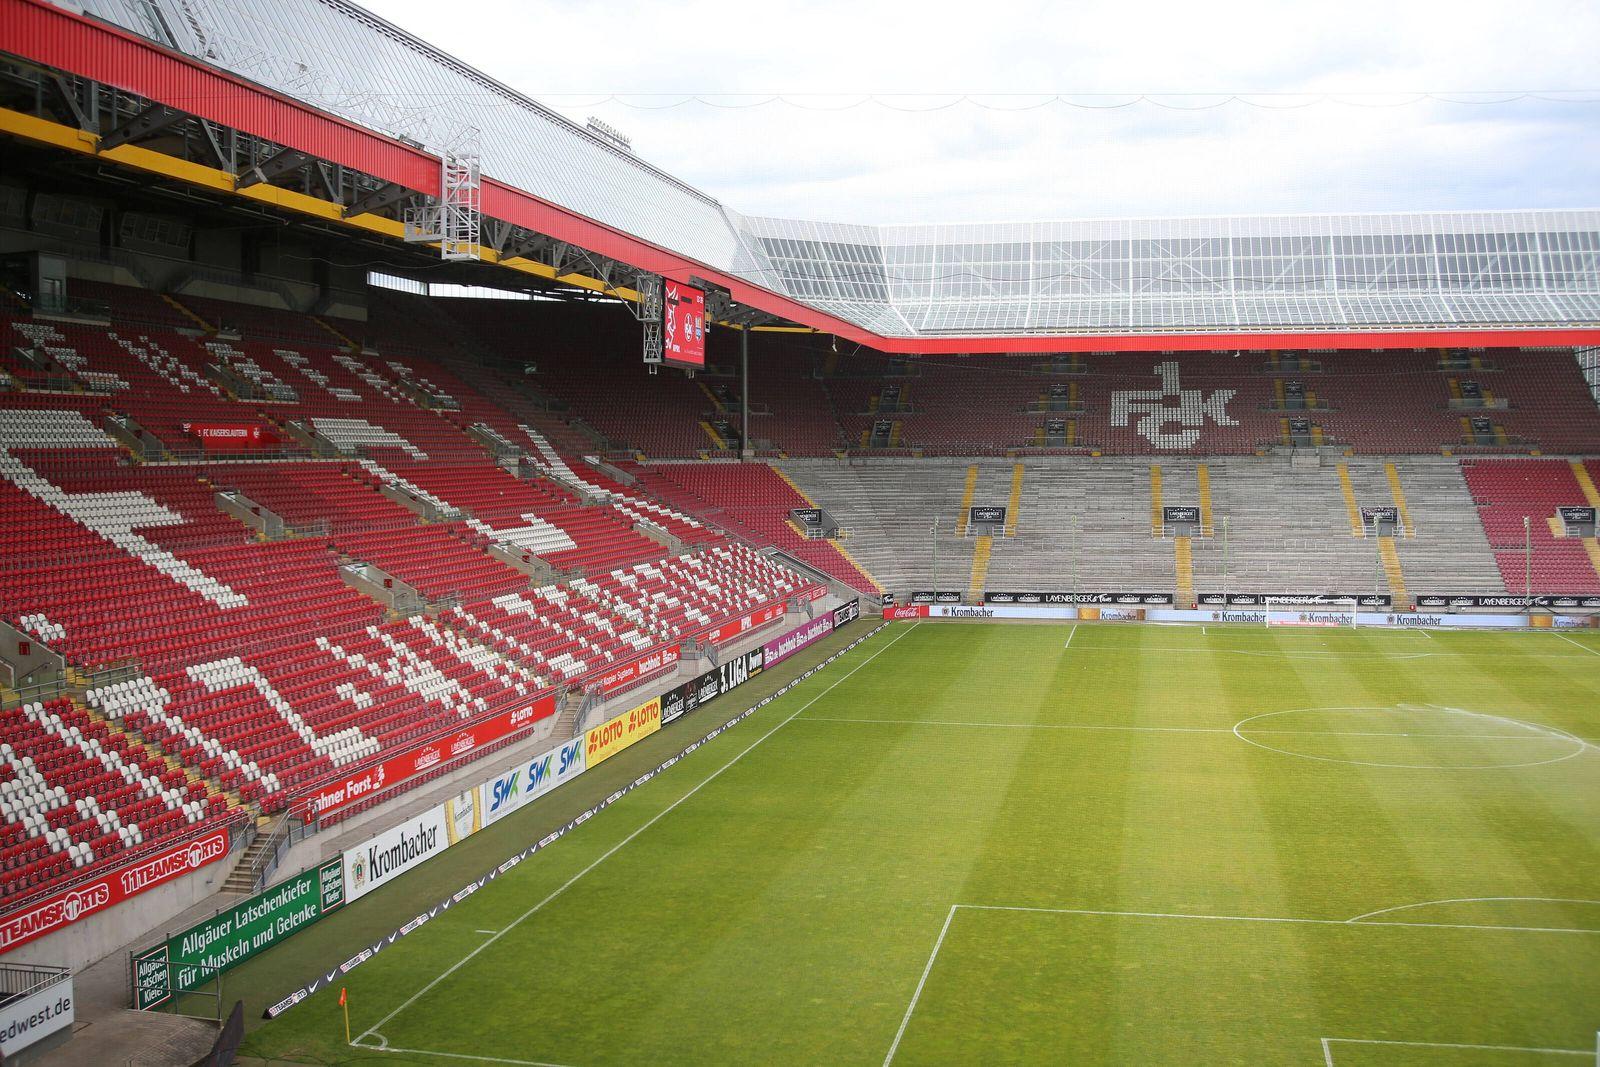 13.06.2020, xklex, Fussball 3.Liga, 1.FC Kaiserslautern - Chemnitzer FC emspor, v.l. Fritz-Walter-Stadion, Geisterspiel